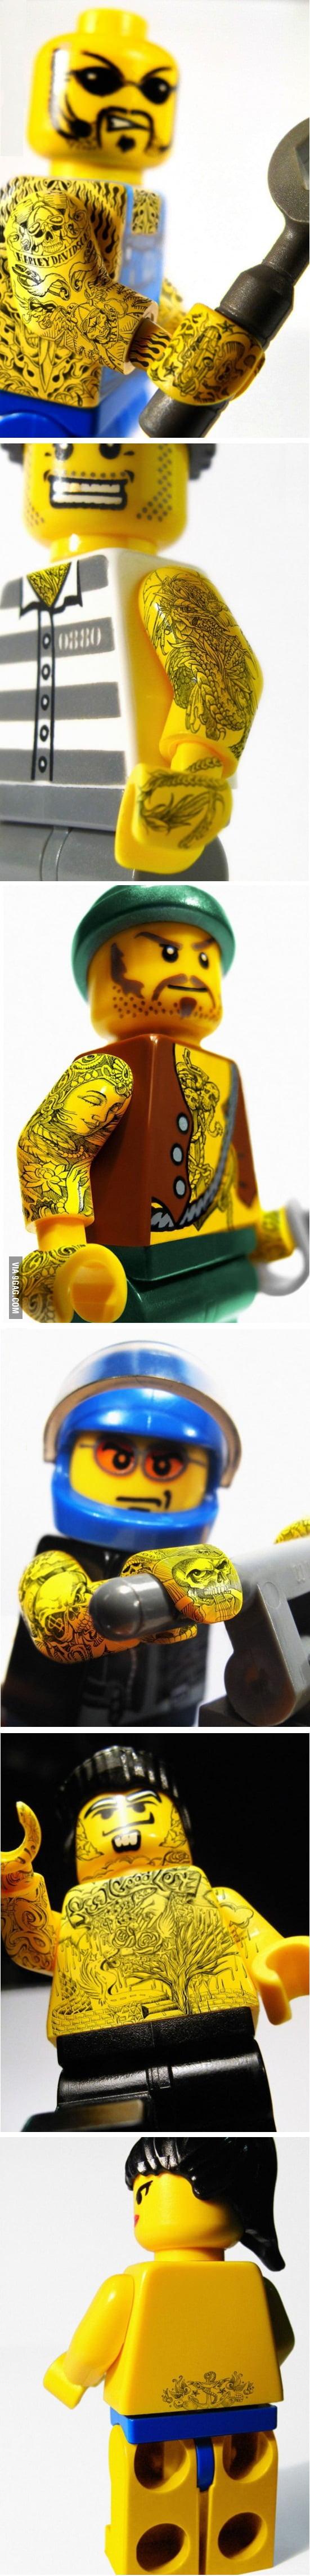 Badass LEGO!